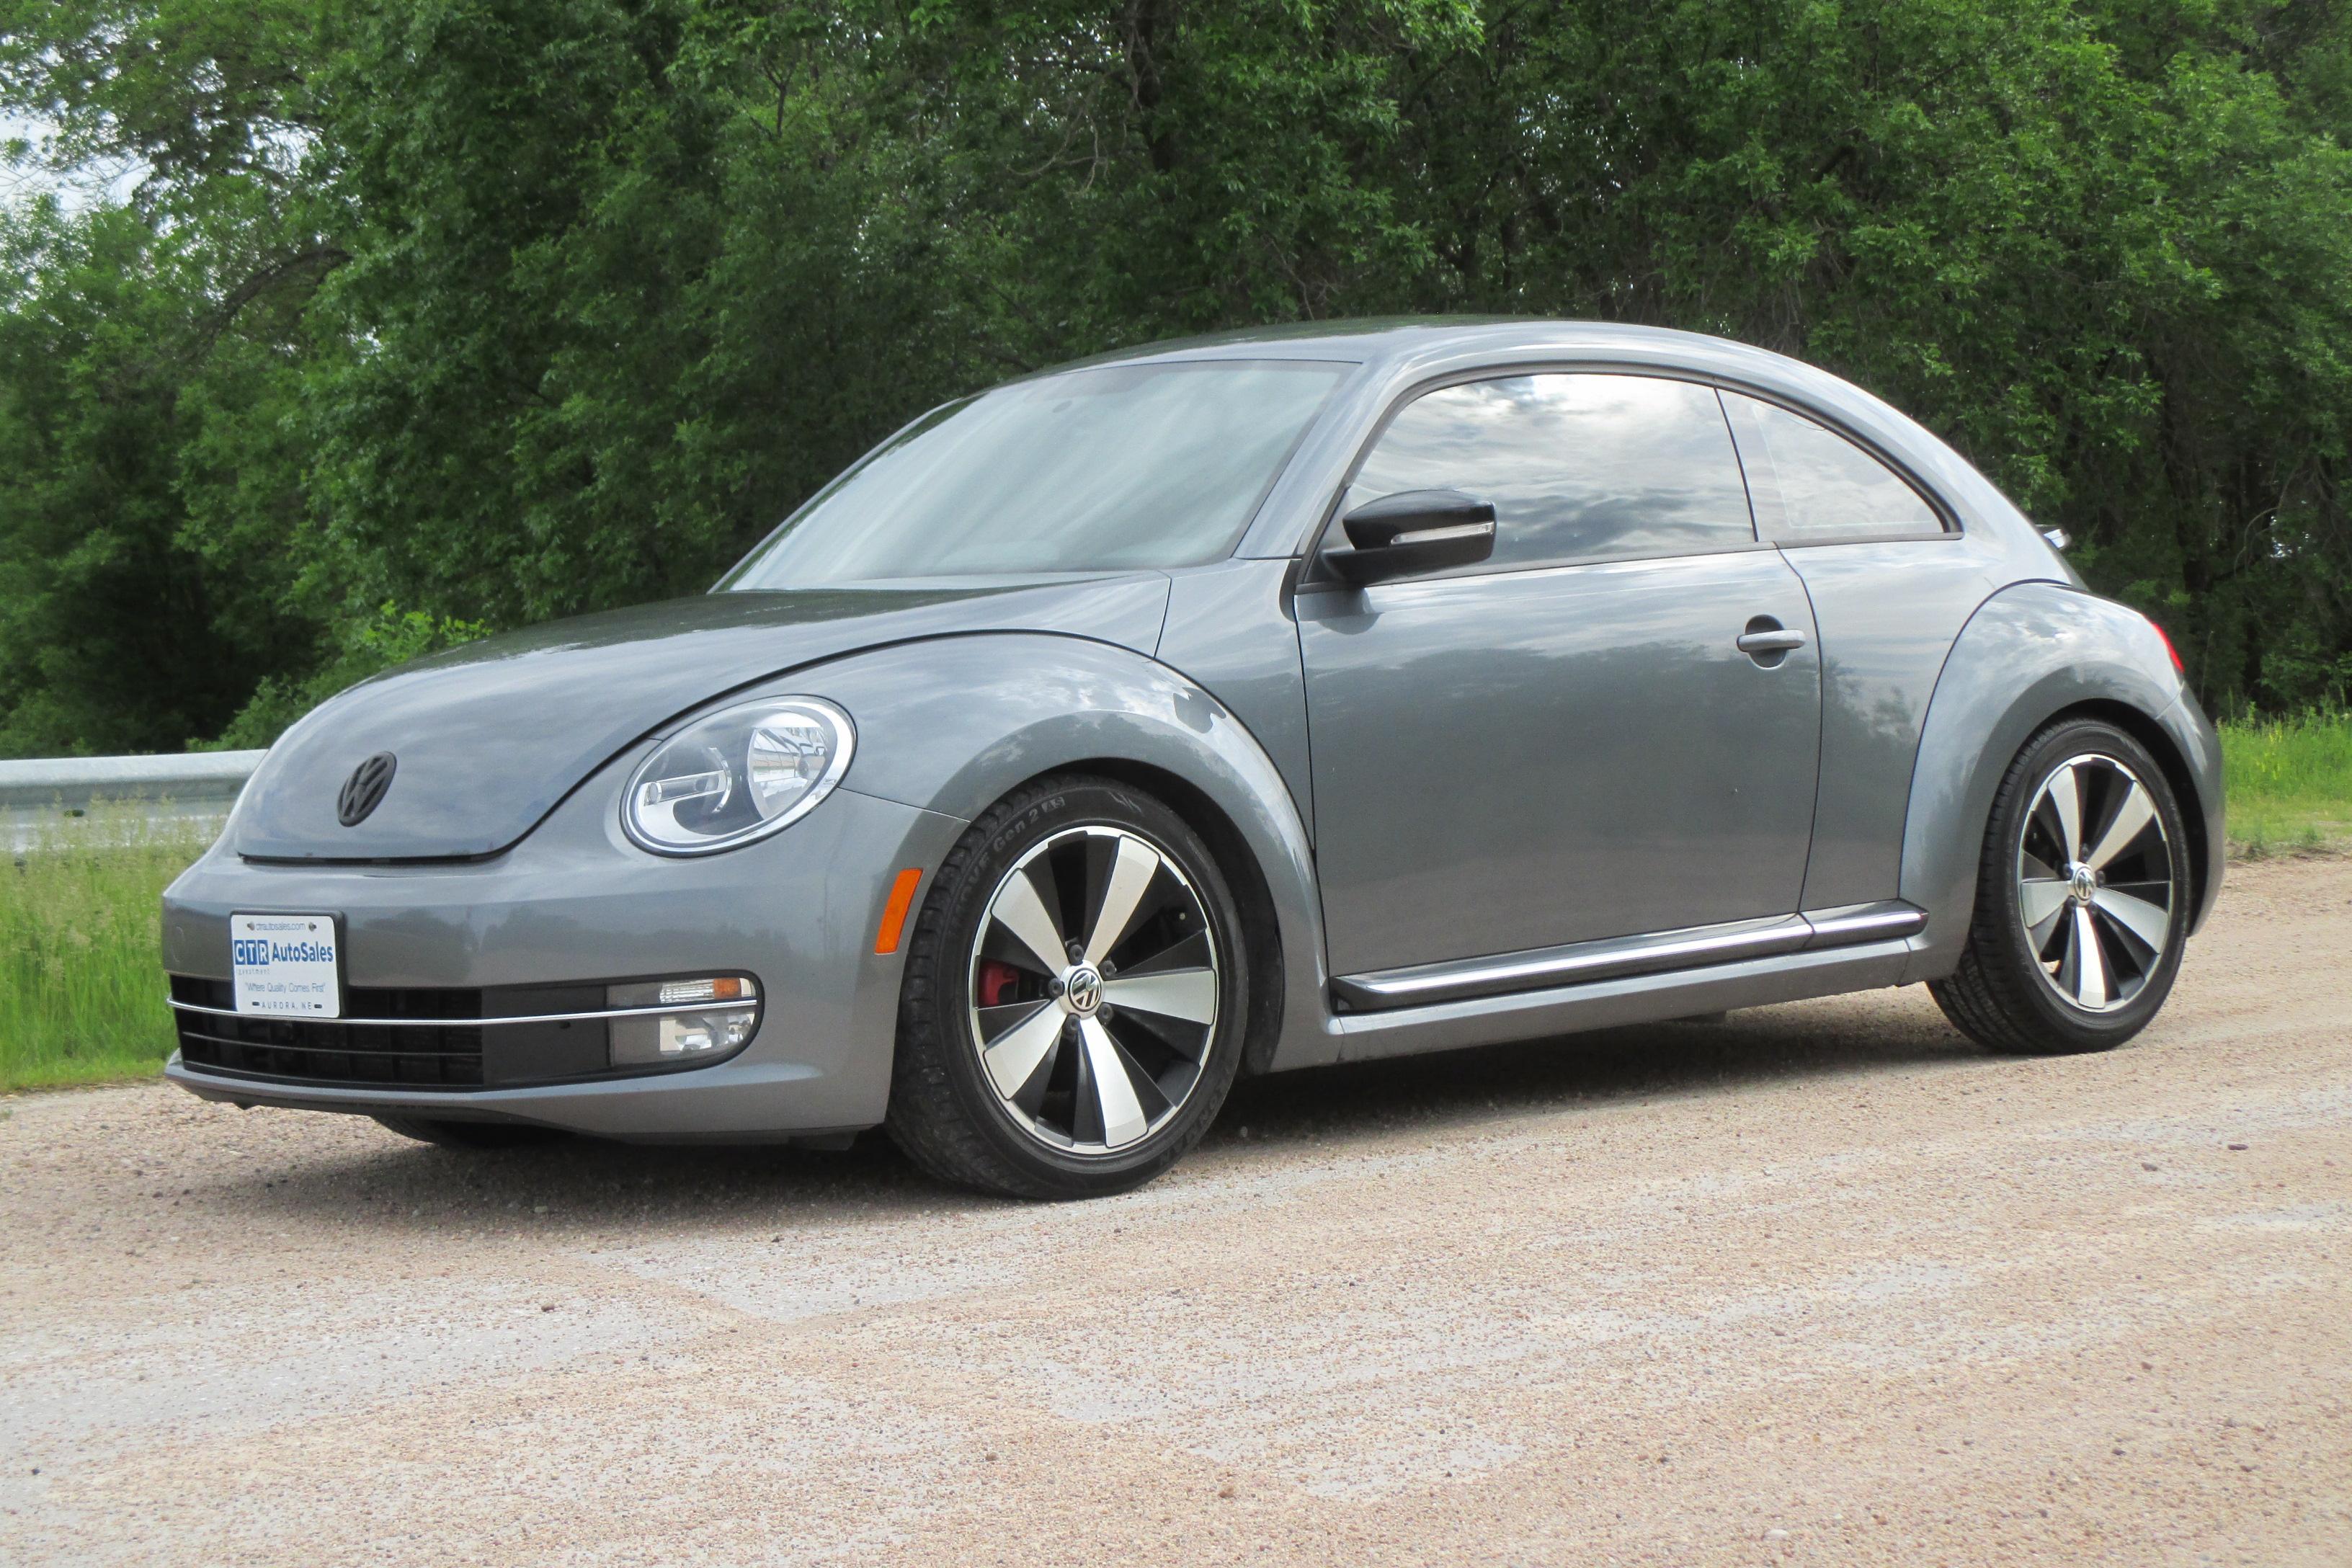 2012 Volkswagon Beetle Turbo